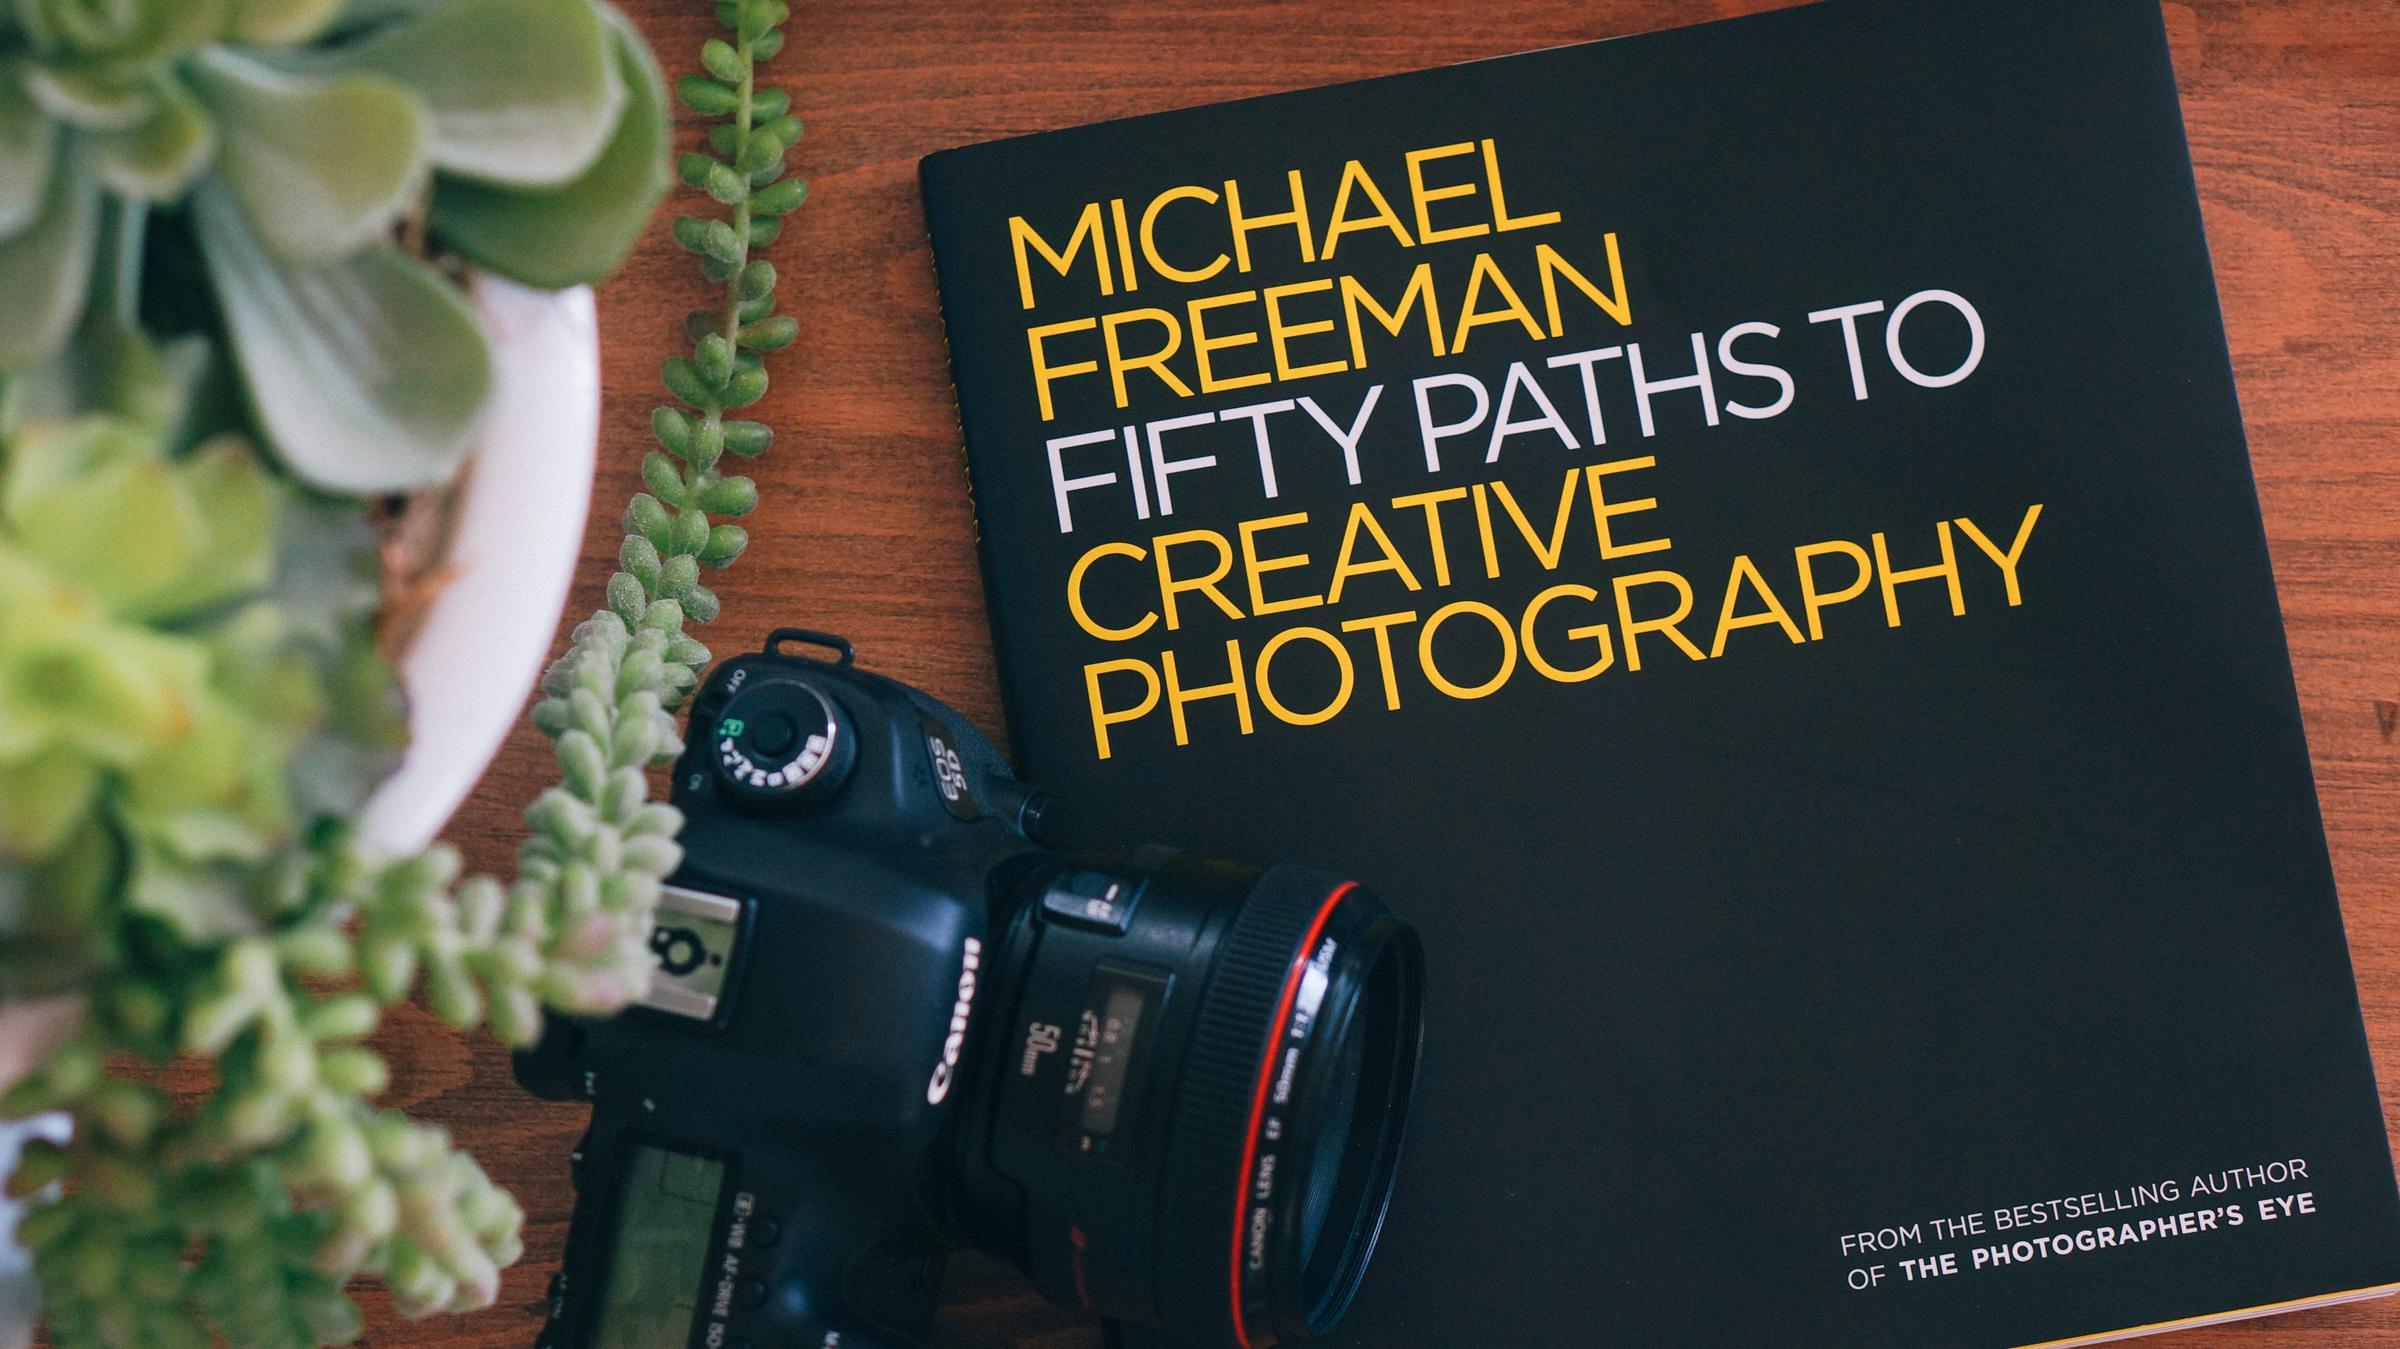 creative-photography-book-02282